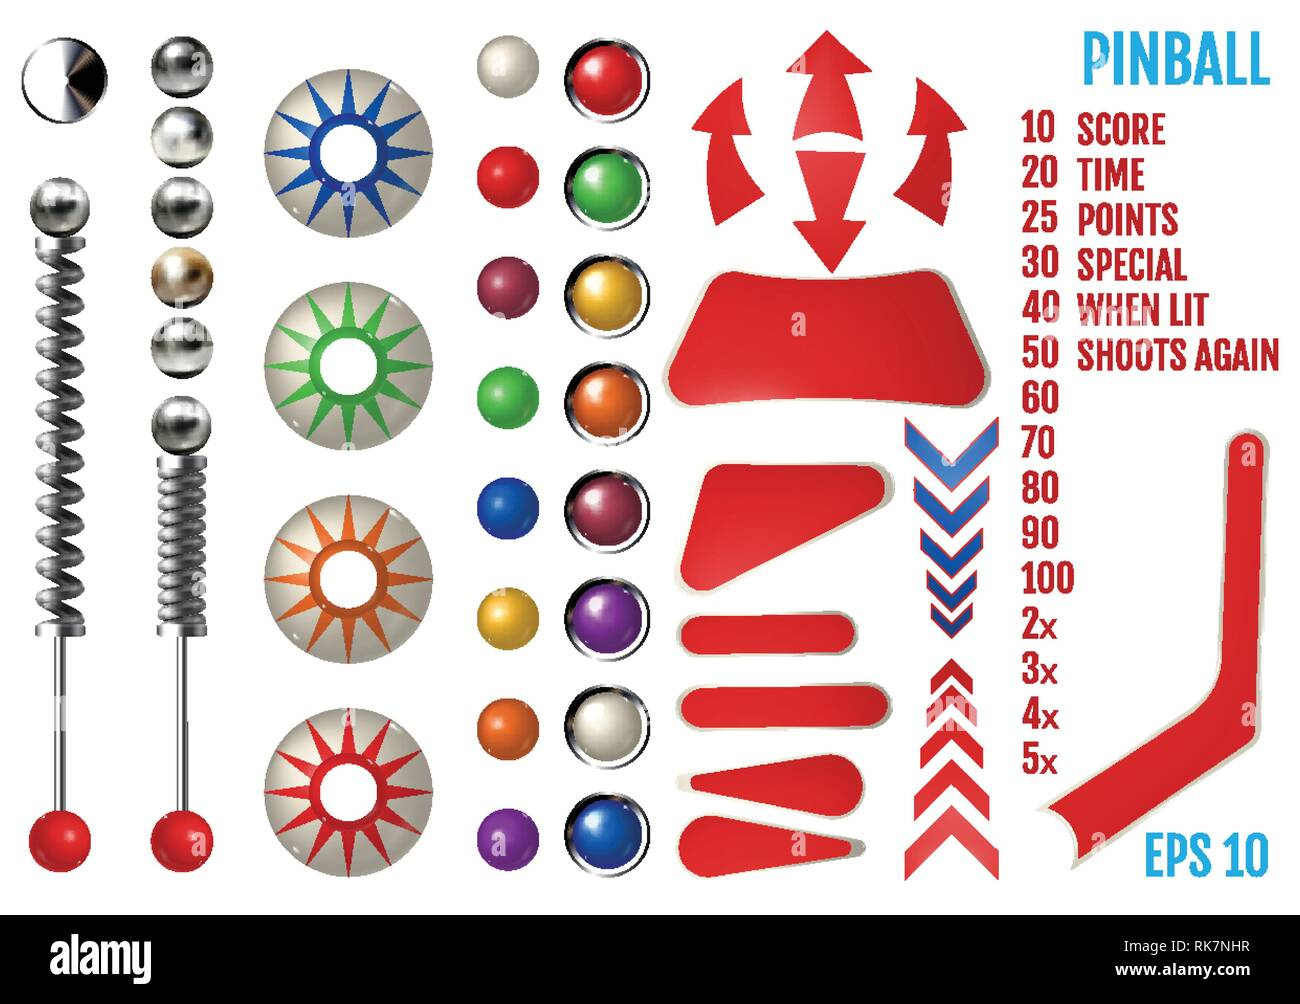 Playfield Pinball Machine Bumpers Stock Photos & Playfield